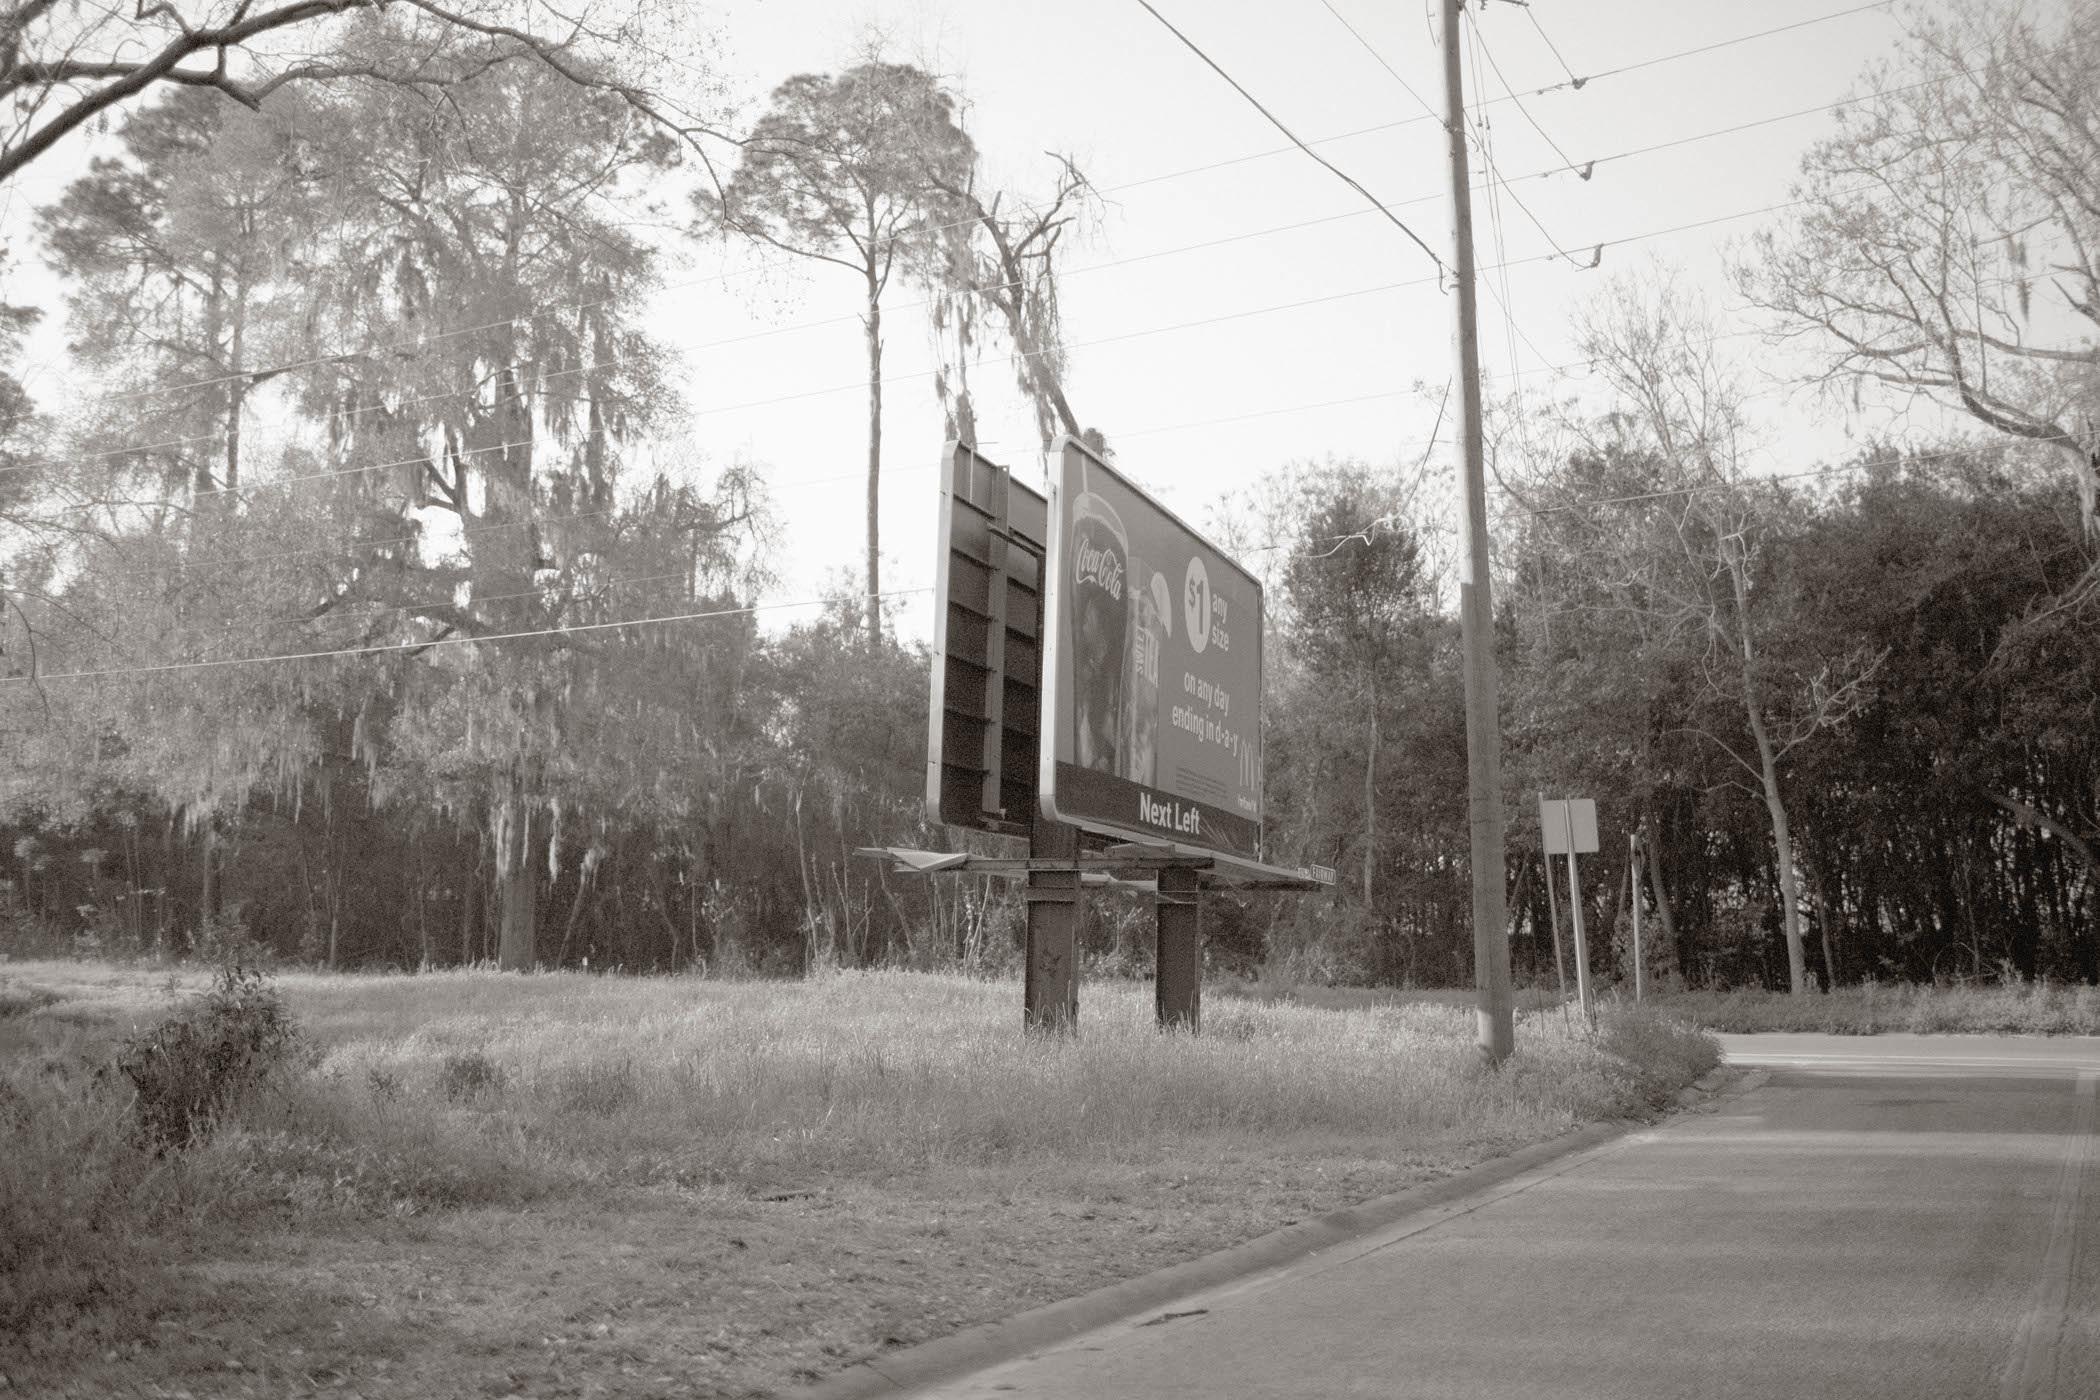 Colin Kelly HWY, Madison County, FL (2)